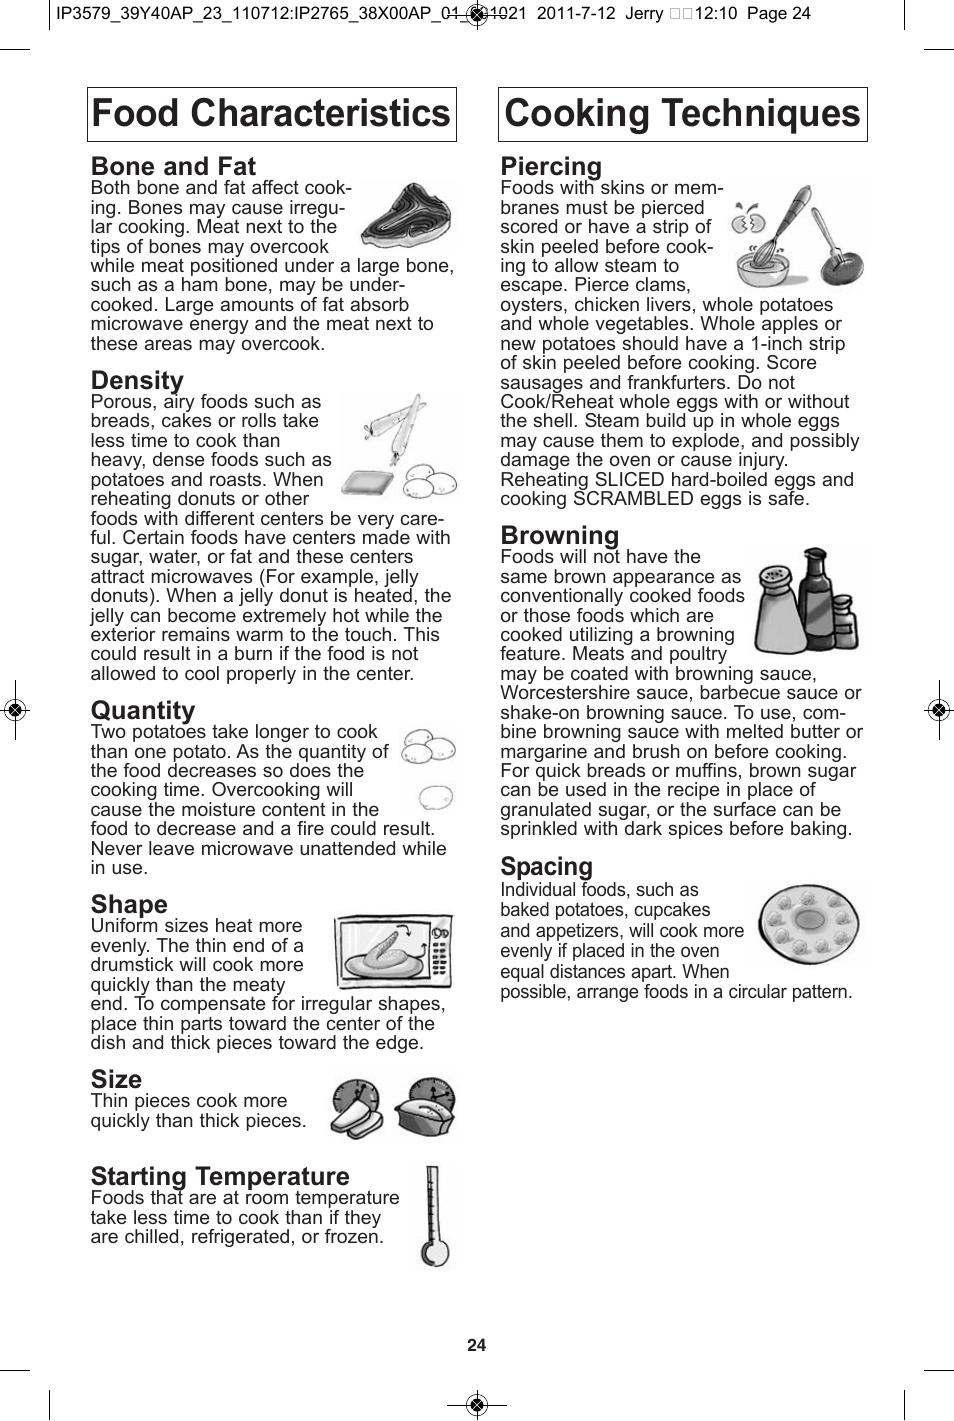 Food characteristics, Cooking techniques, Food